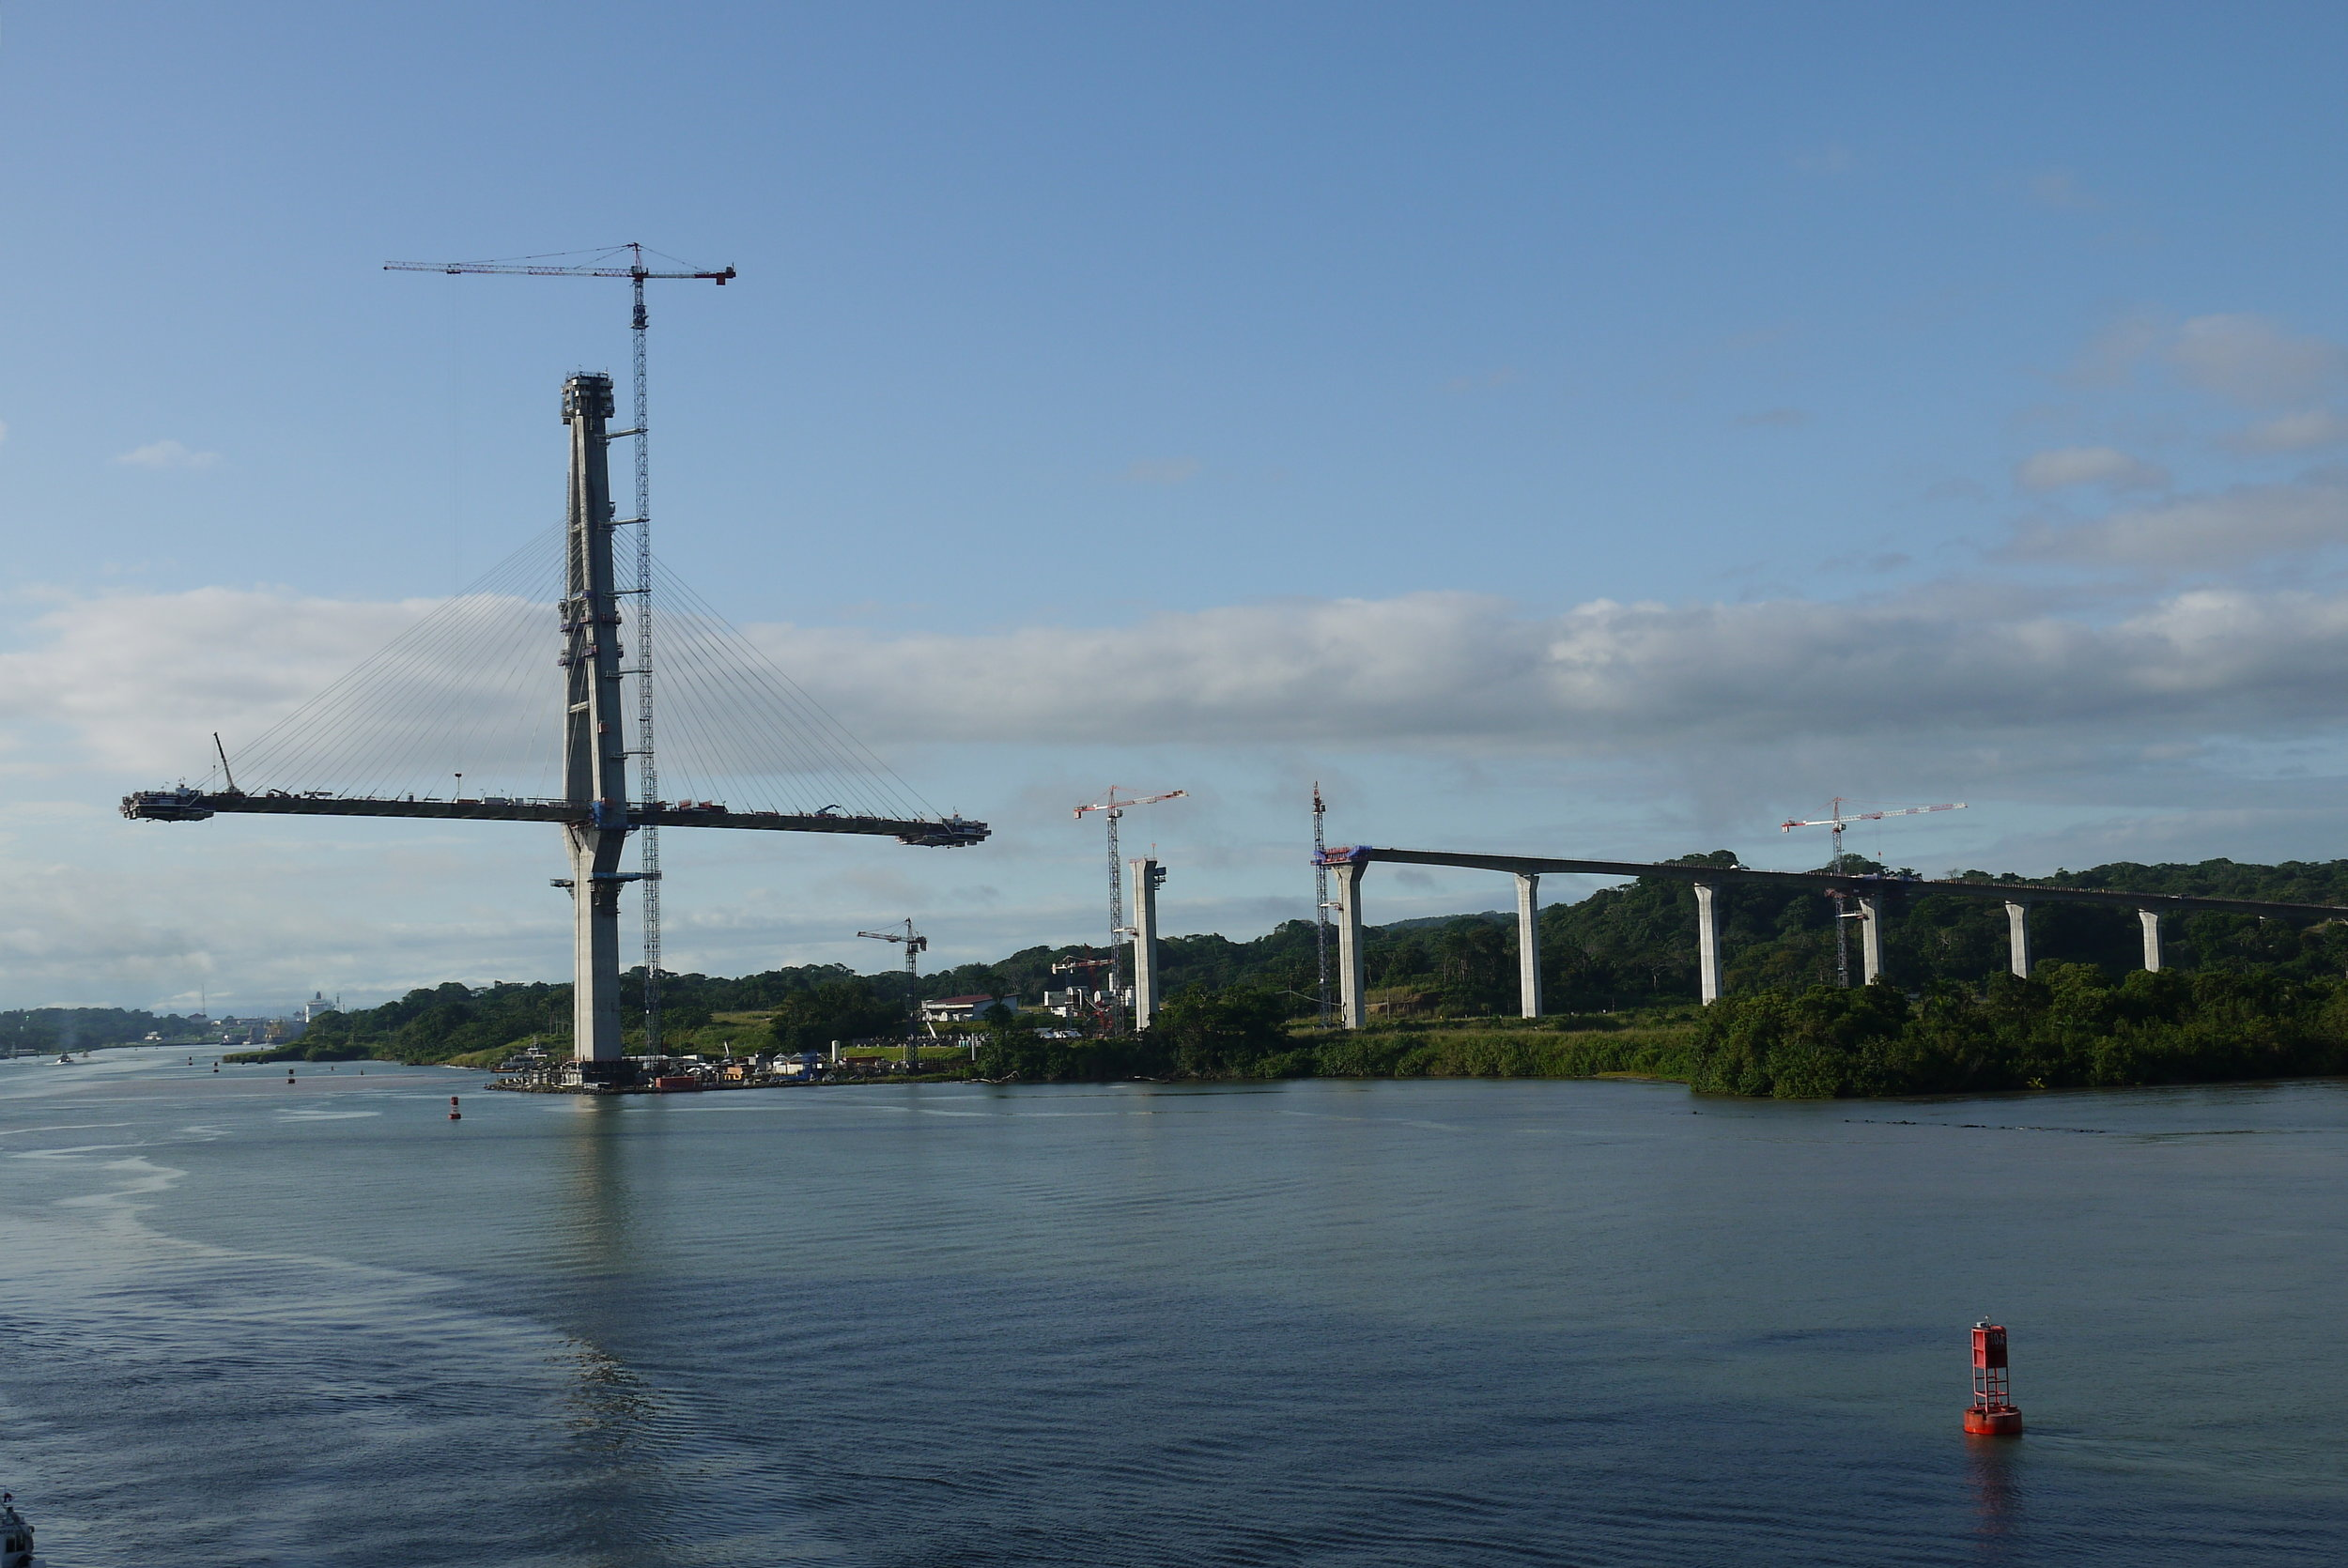 Panama Canal Cruise - 099.jpg